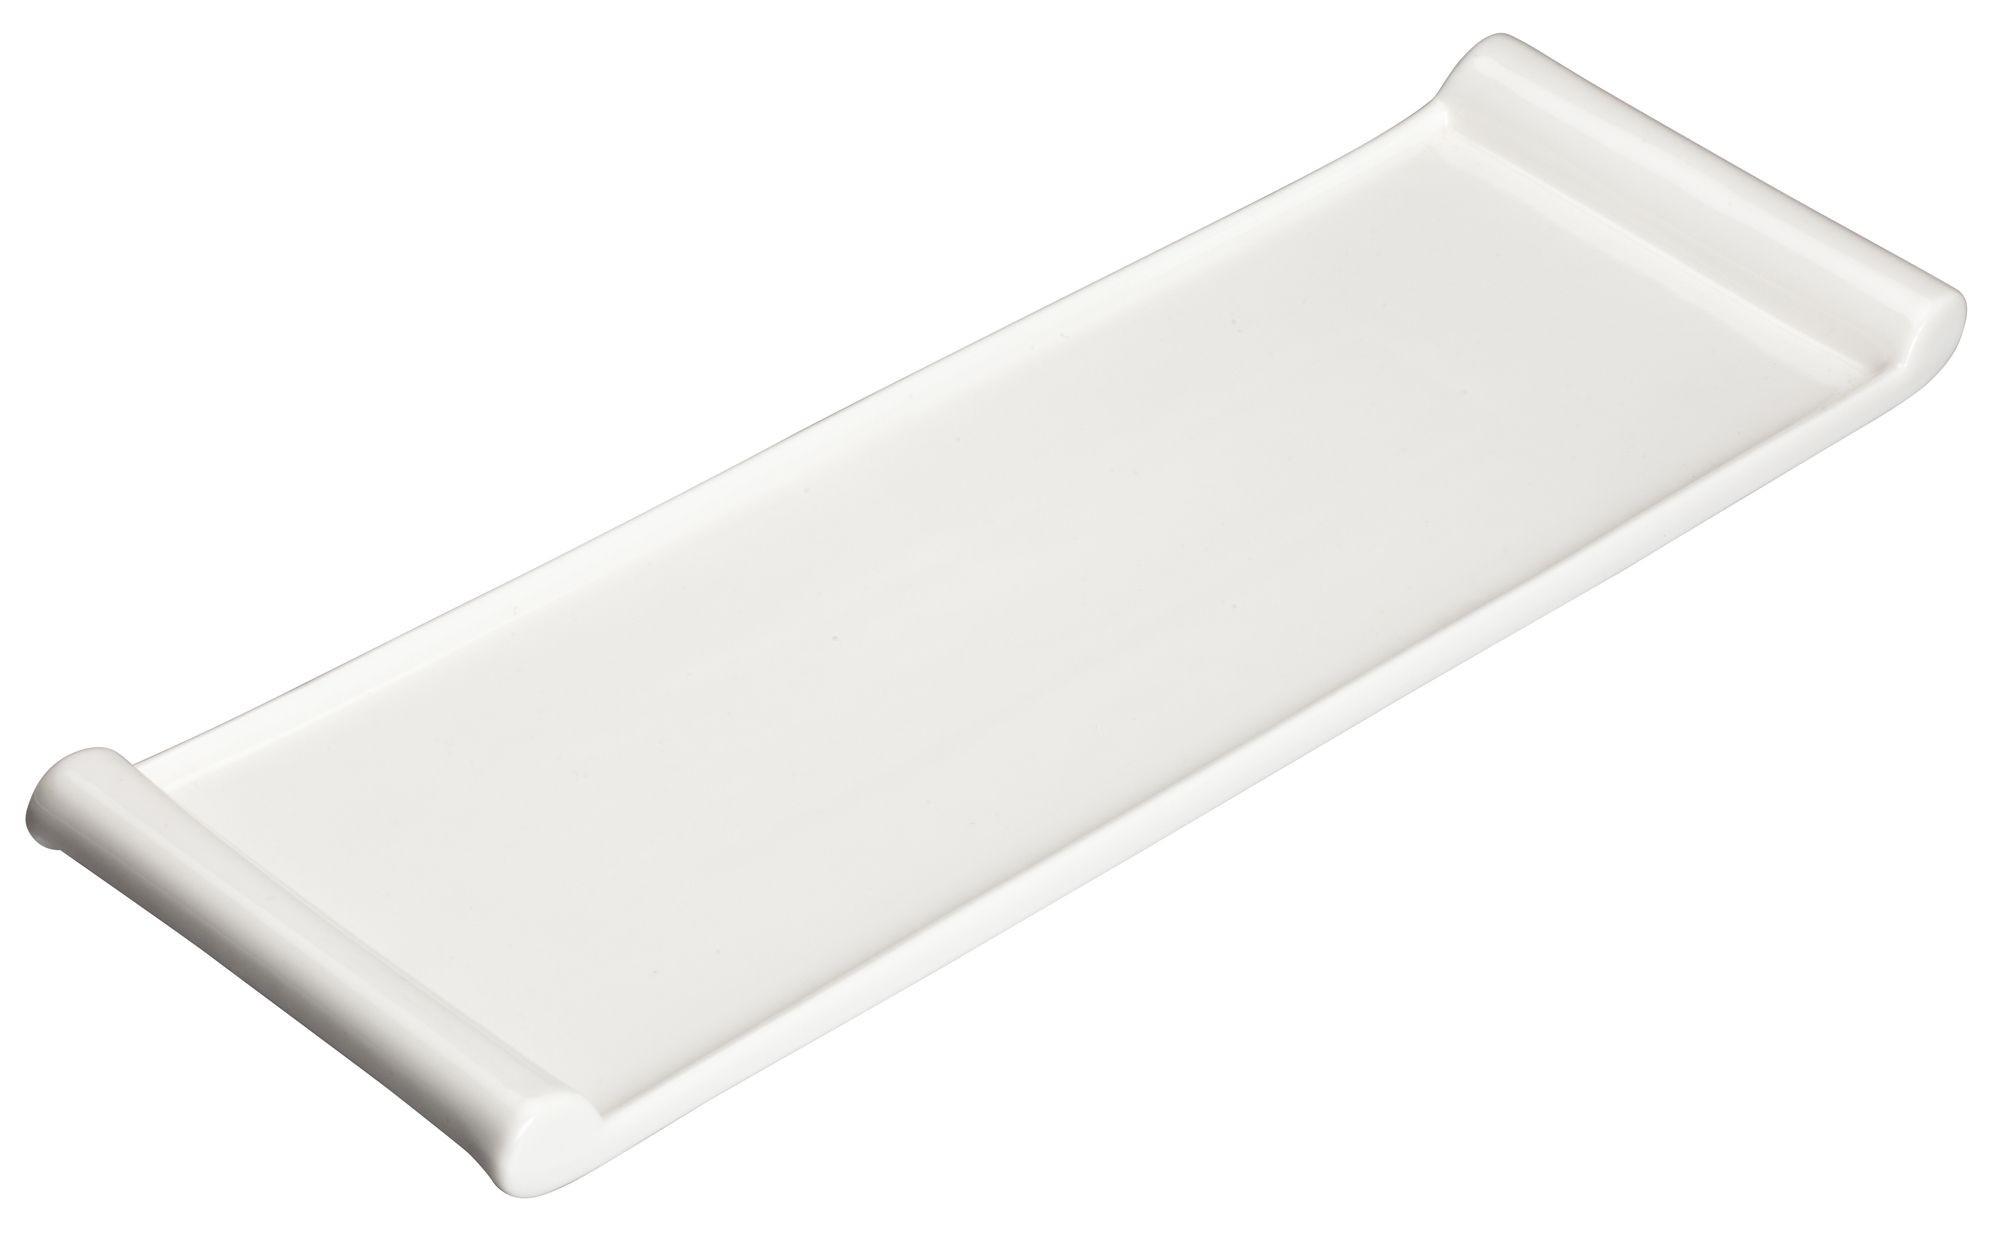 "Winco WDP017-116 Paredes Porcelain Bright White Rectangular Platter 14"" x 4-1/2"""